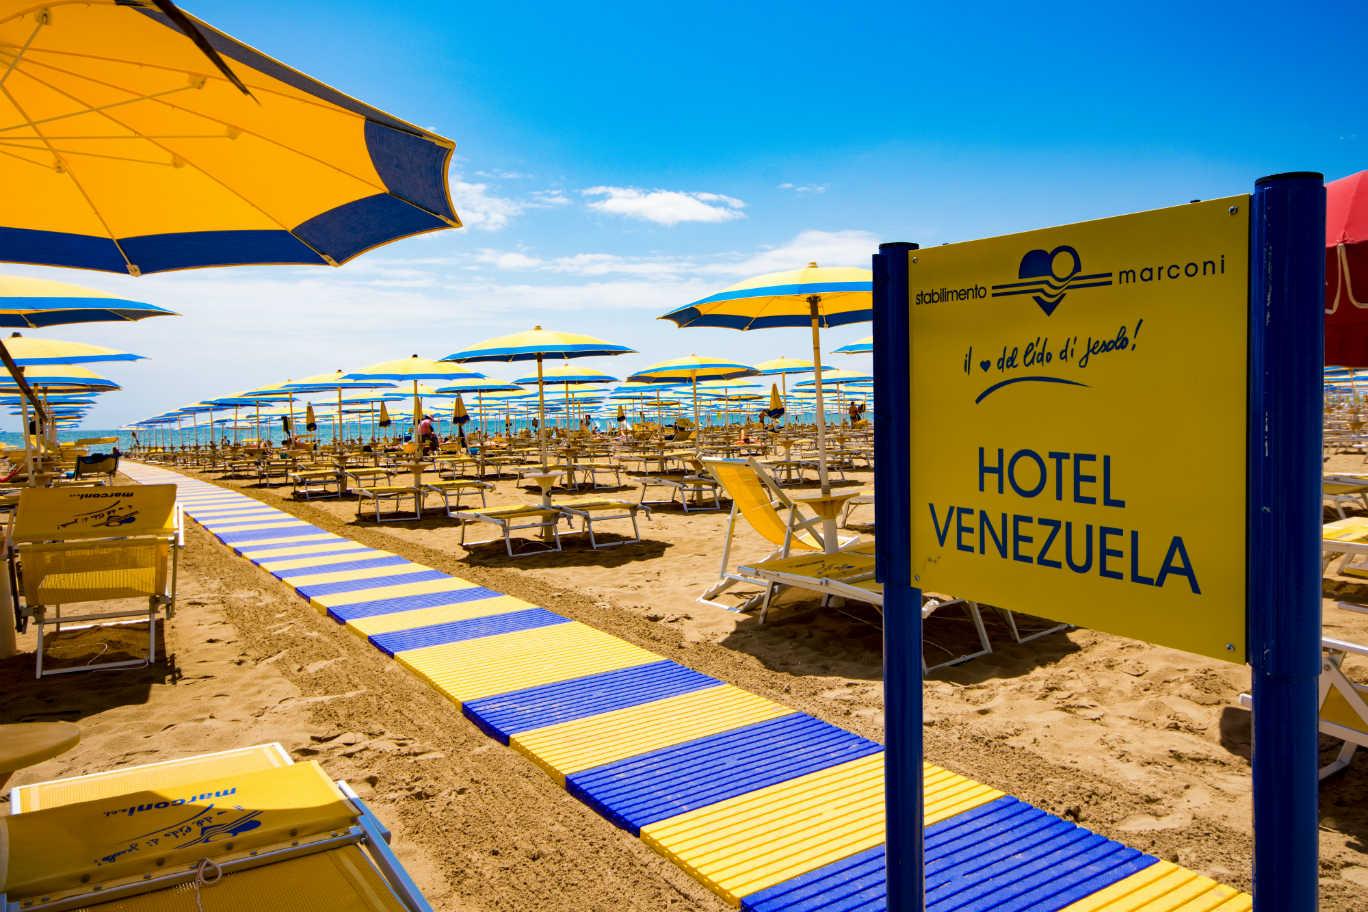 https://www.hotelvenezuela.it/wp-content/uploads/2019/05/Passerella_Spiaggia_Jesolo_Hotel_Venezuela.jpg